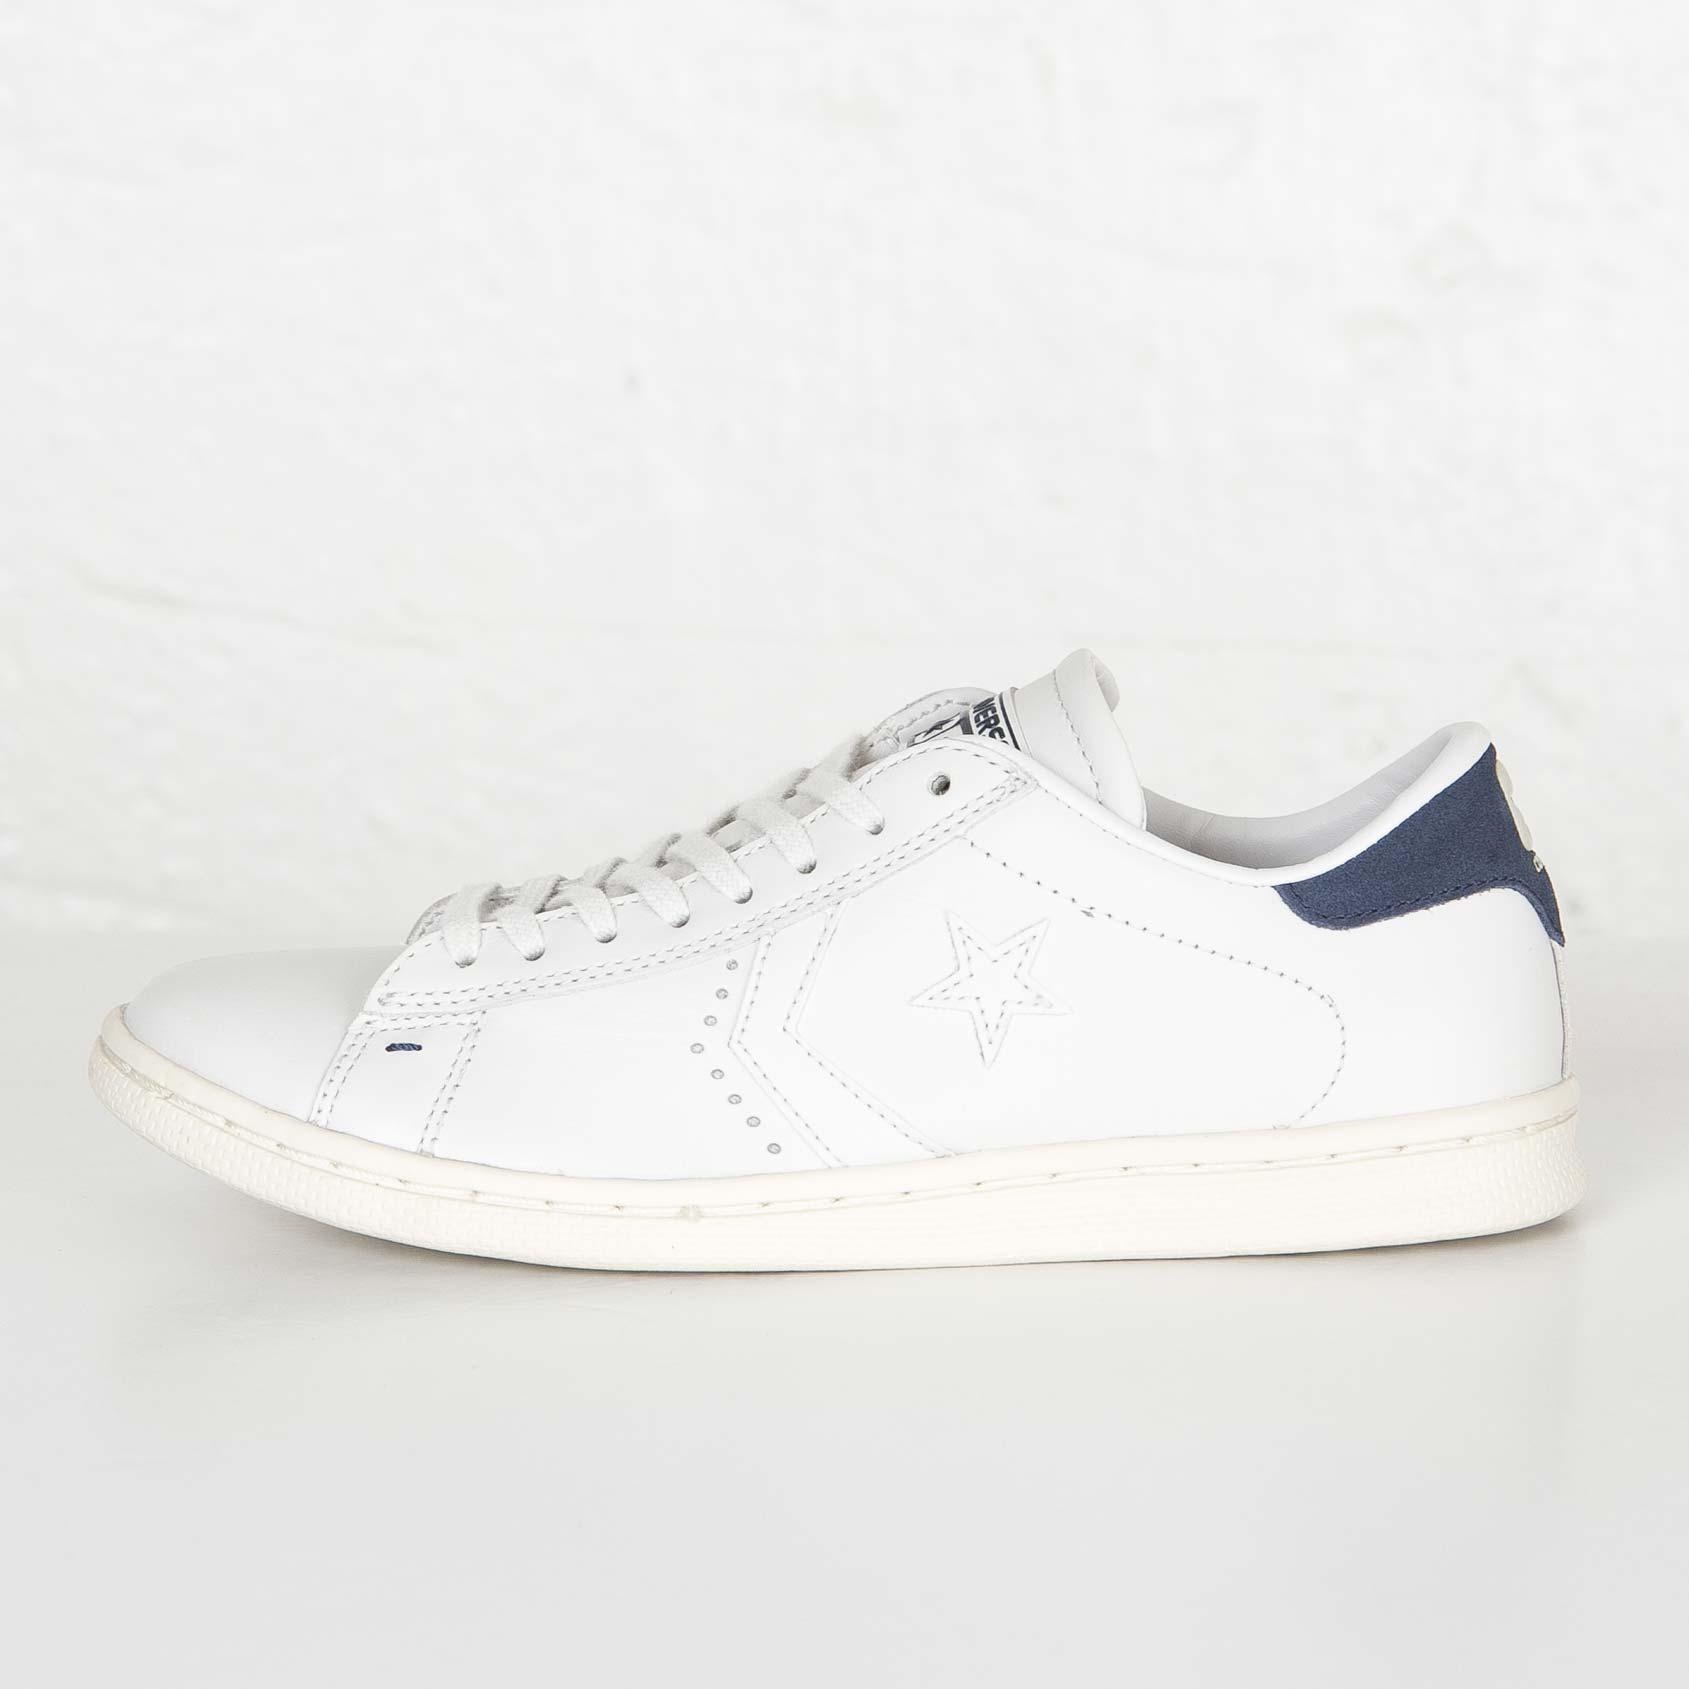 Converse Pro Leather LP-Ox - 147789c - SNS   sneakers & streetwear ...